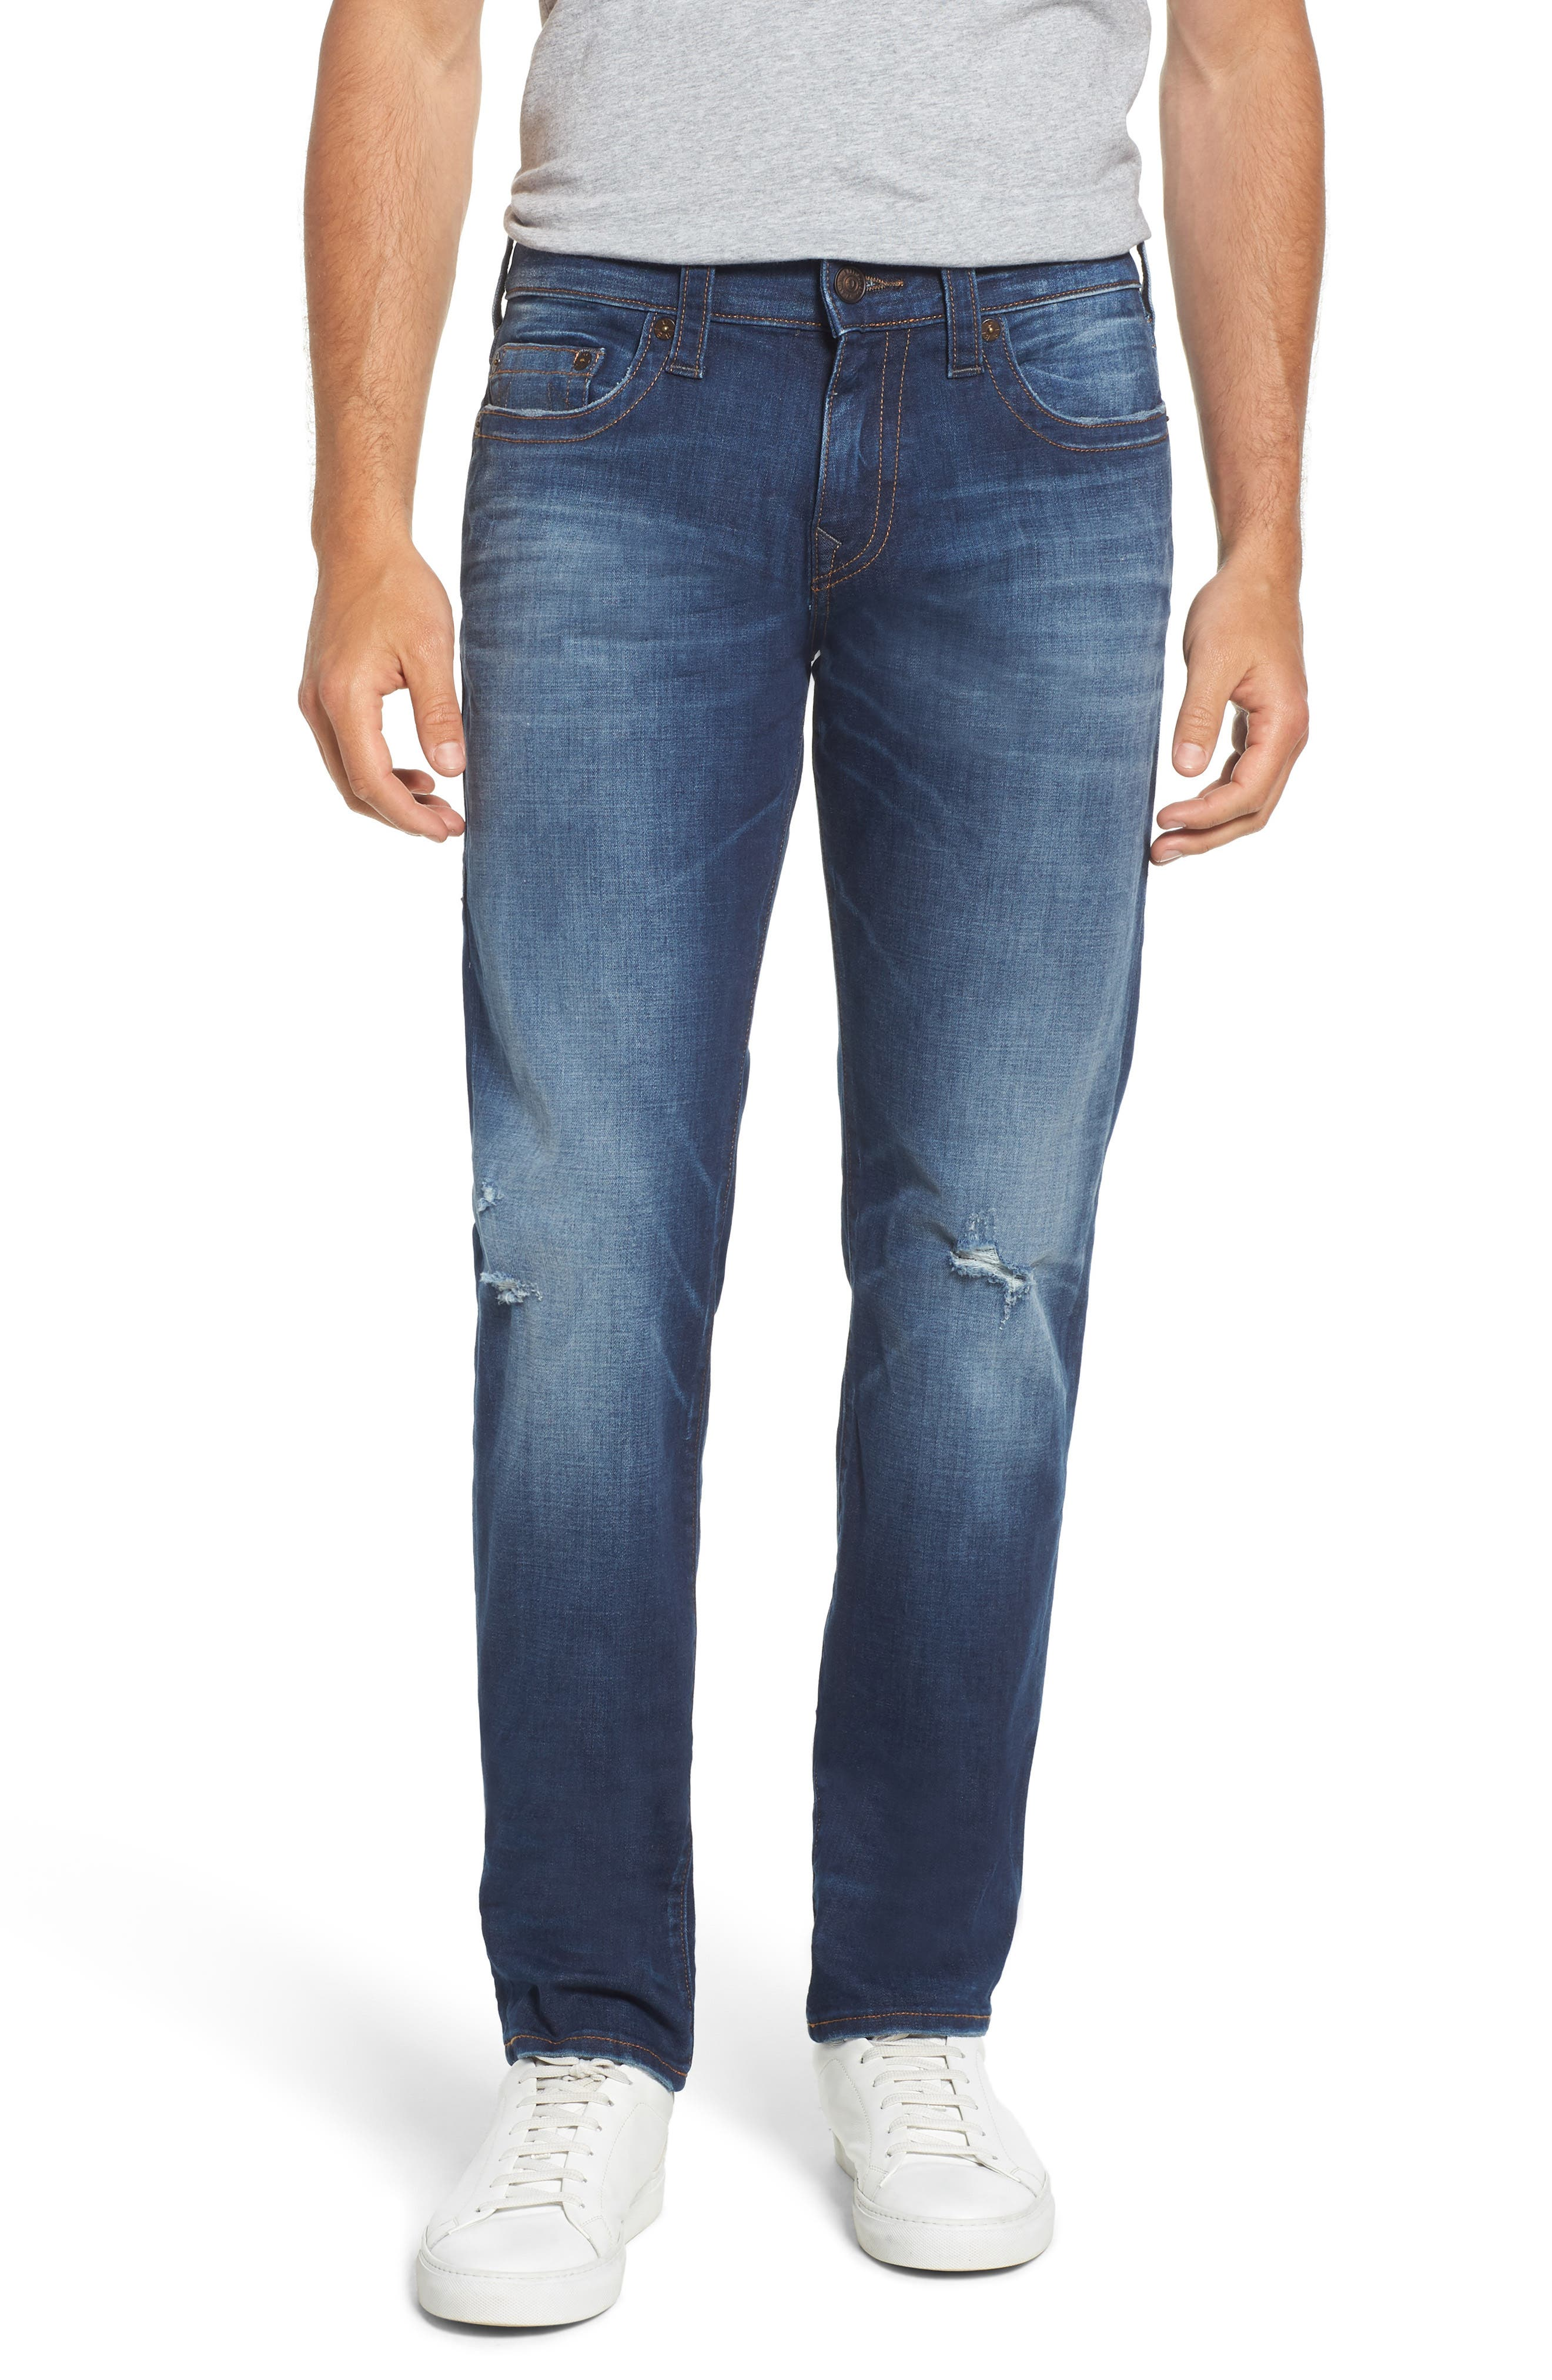 Geno Straight Leg Jeans,                             Main thumbnail 1, color,                             Suspect